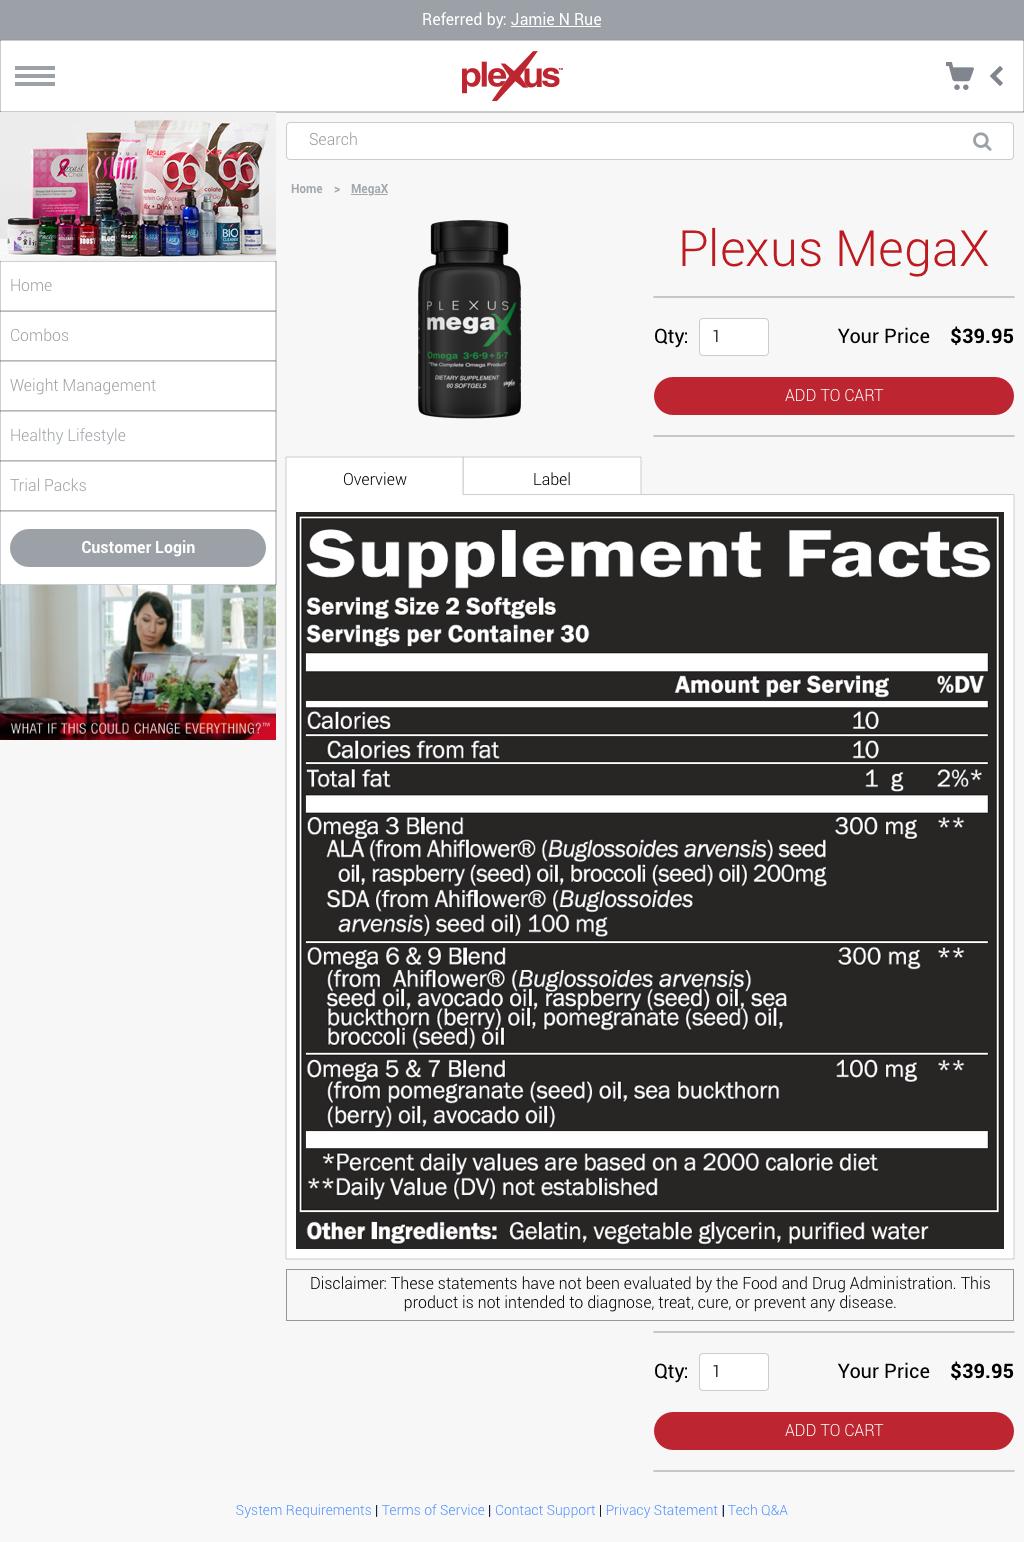 Retail - Product Details Page > Label